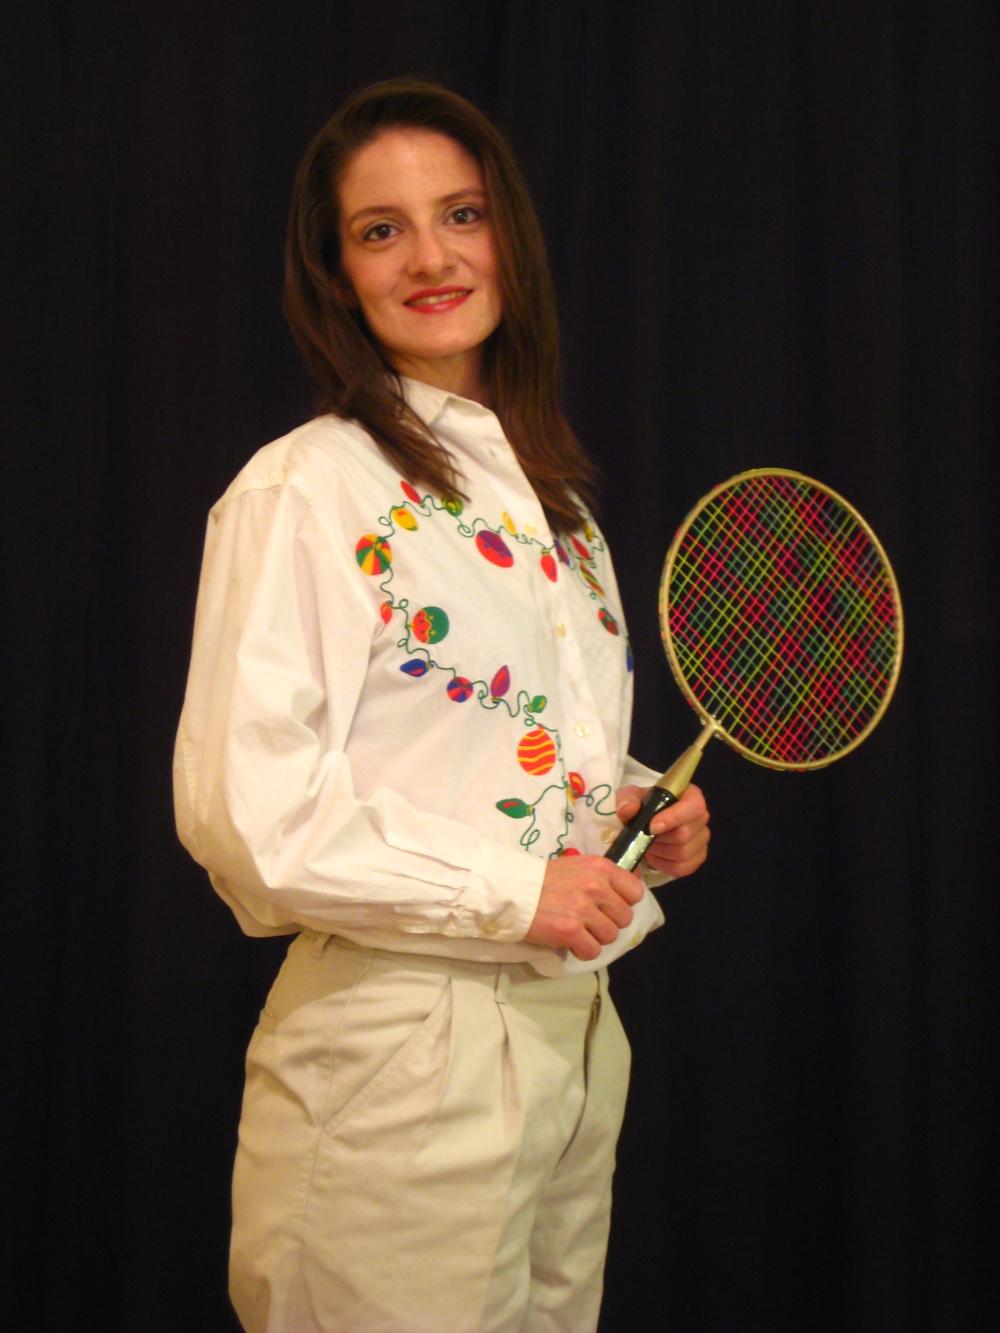 badminton8.jpg